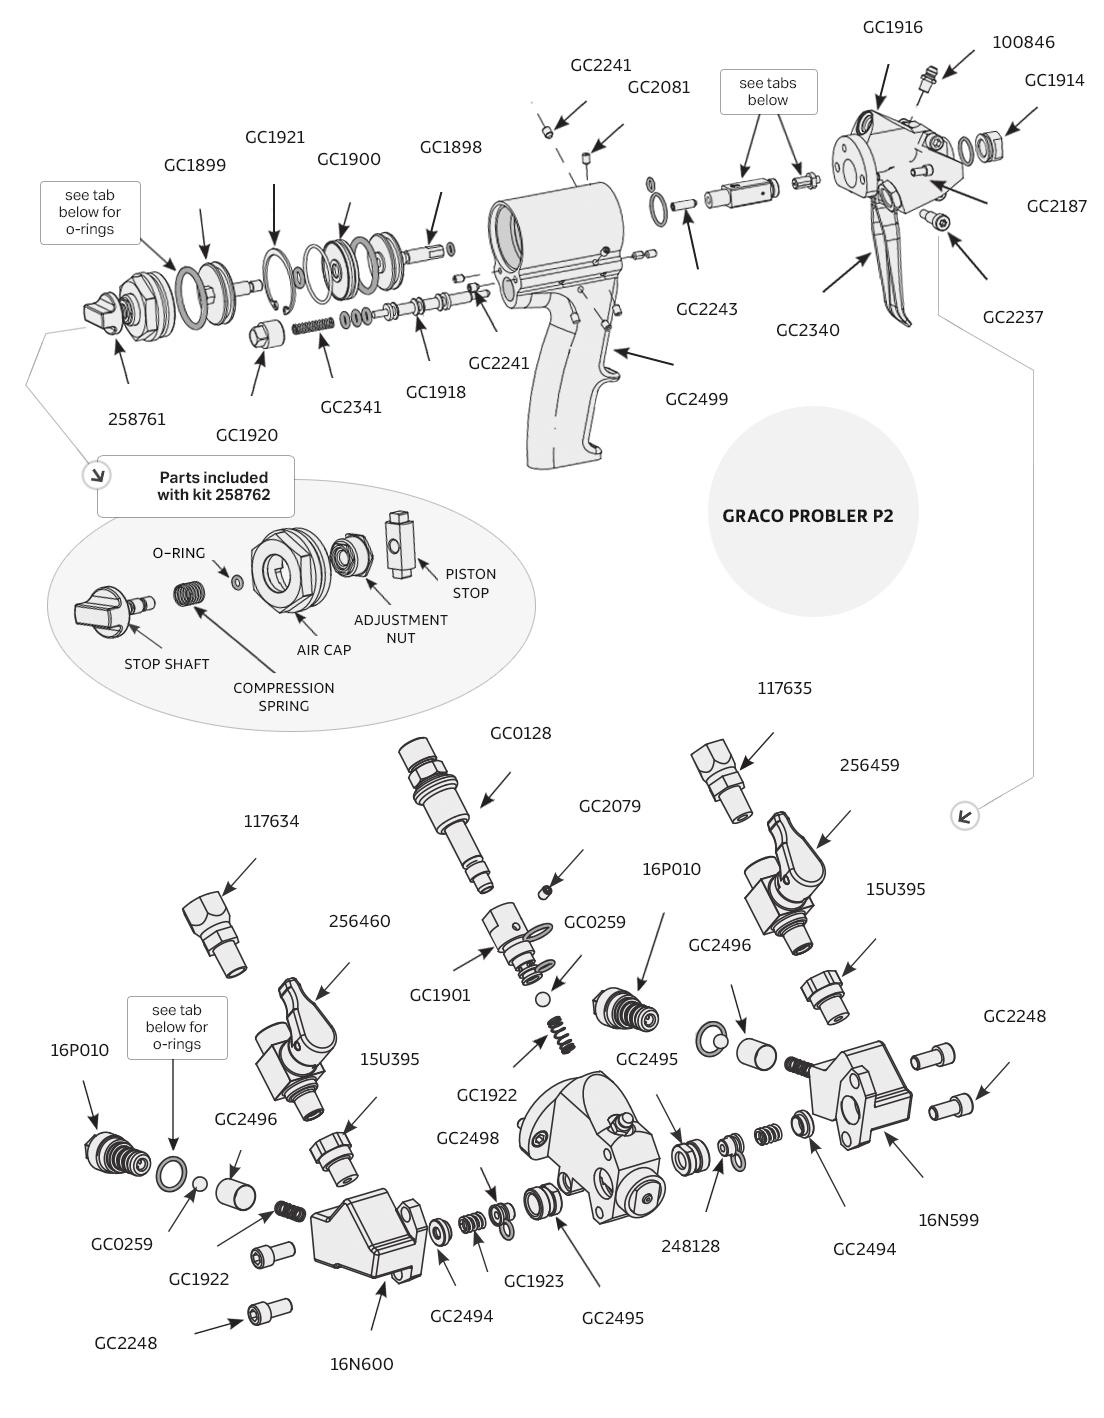 Graco Probler P2 Plural Component Spray Gun